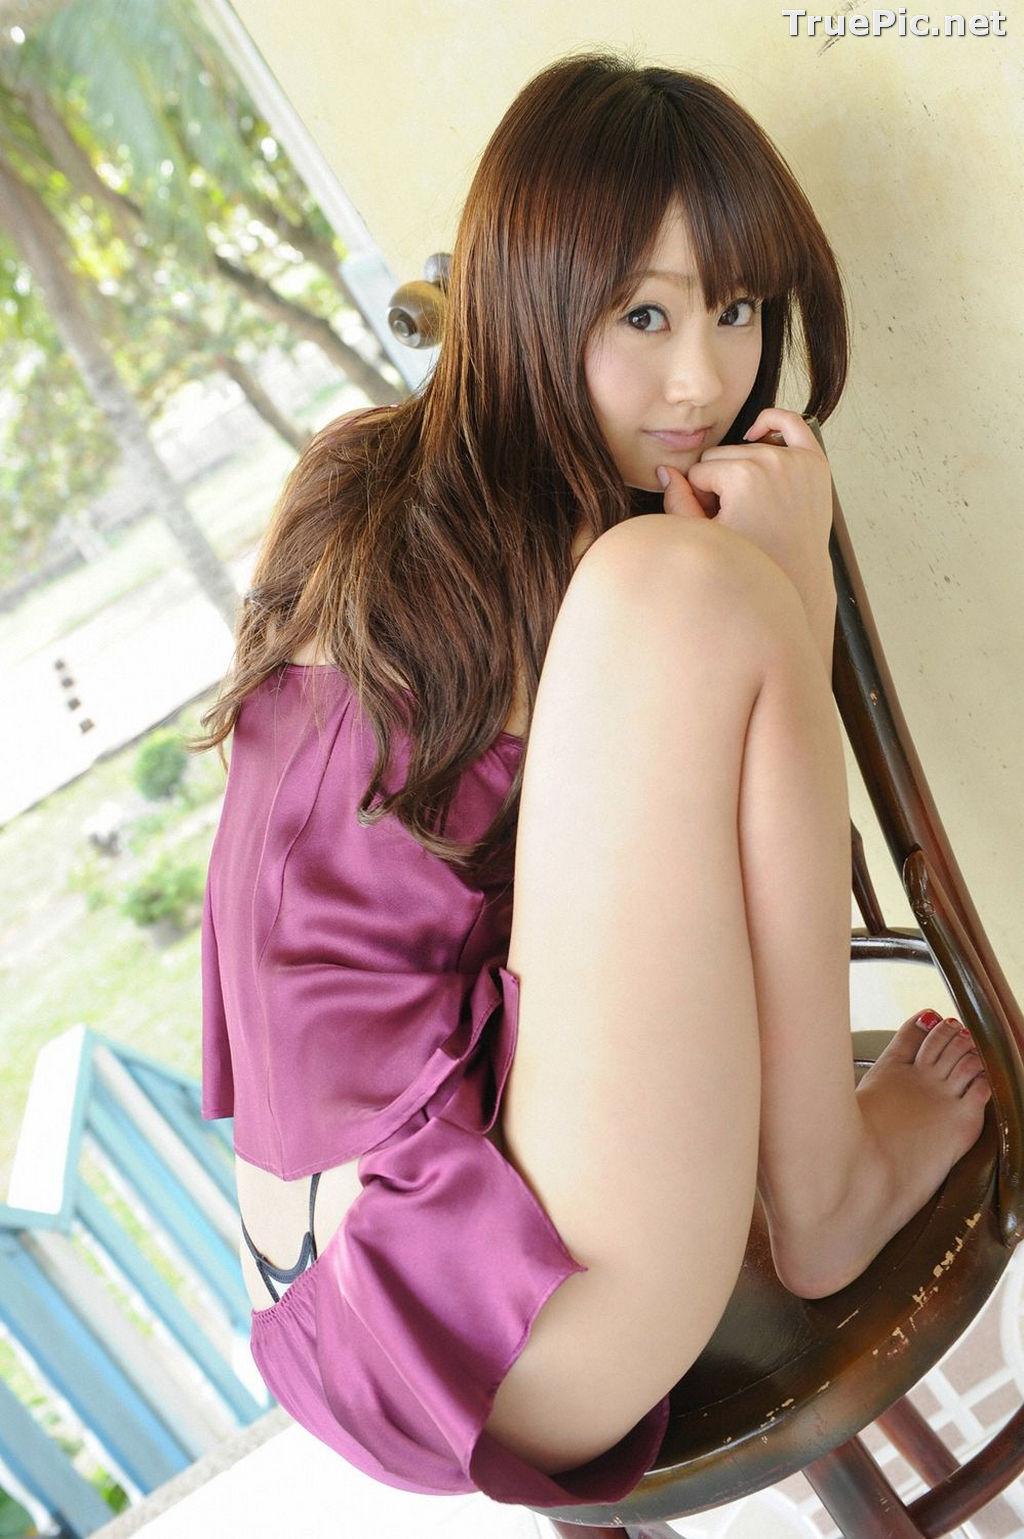 Image [YS Web] Vol.403 - Japanese Tarento and Gravure Idol - Hamada Shoko - TruePic.net - Picture-4